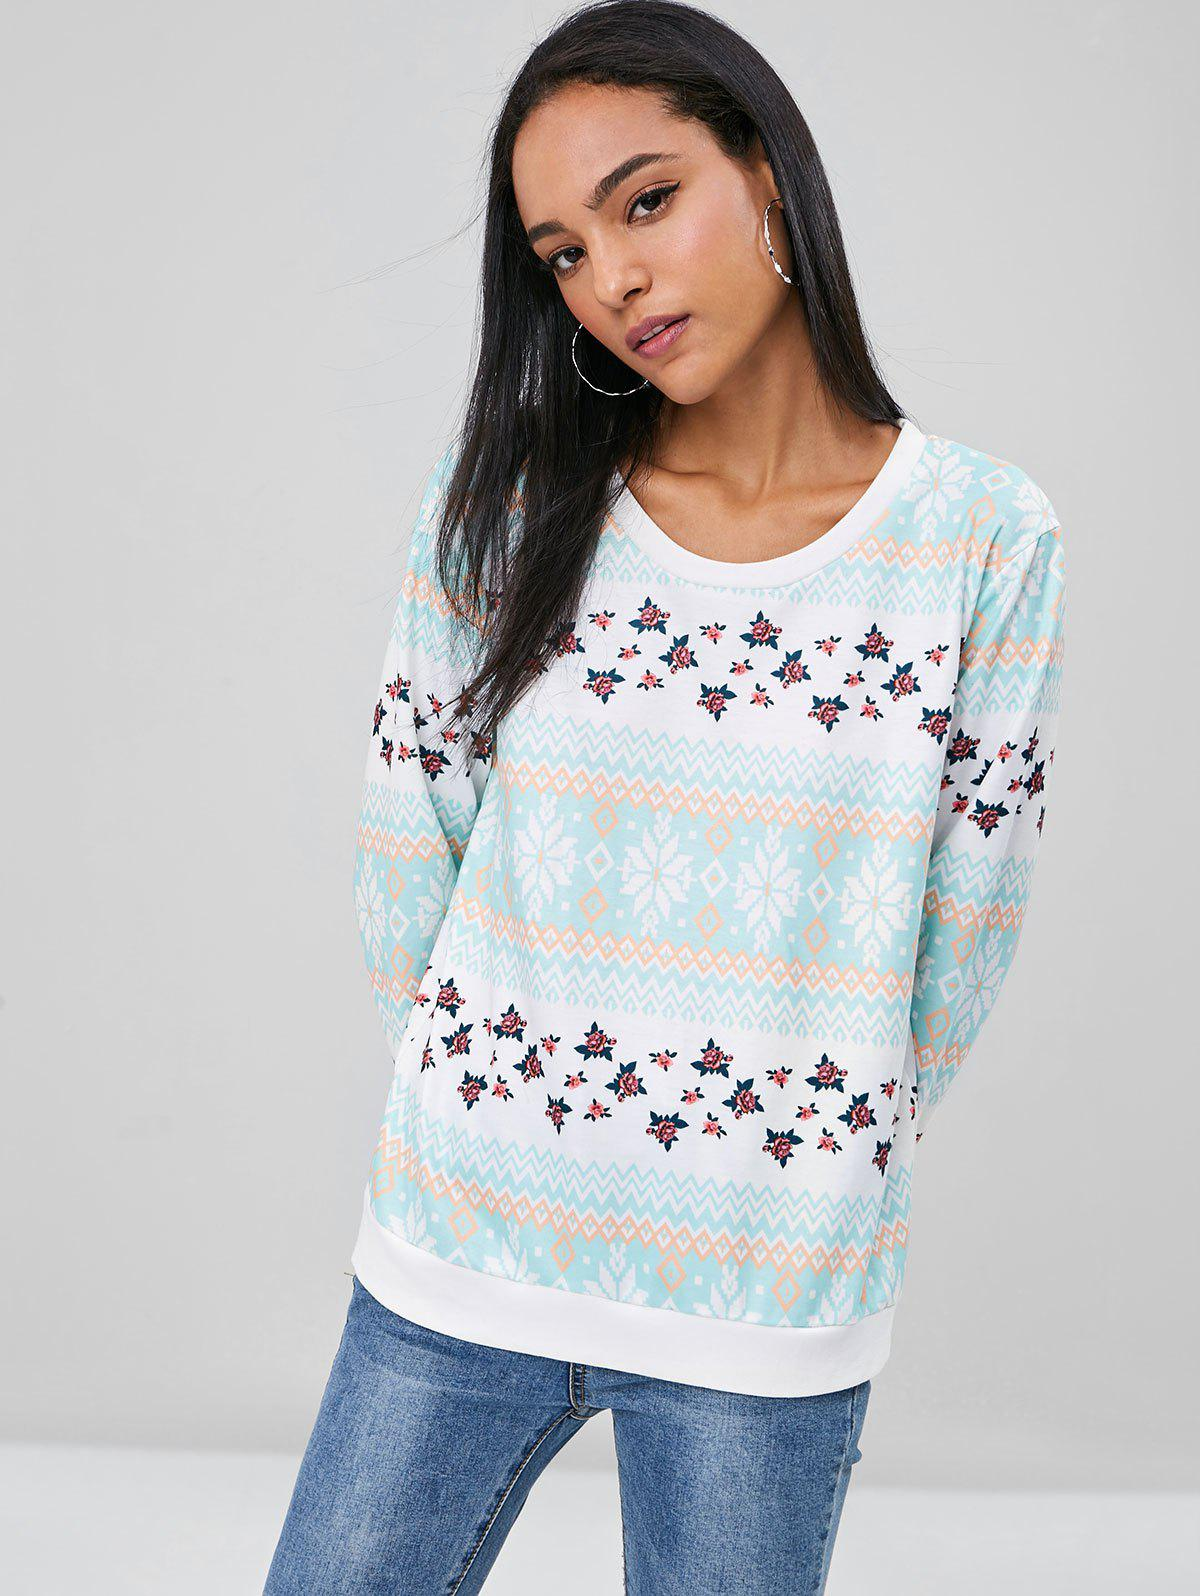 Zig Zag Floral Sweatshirt